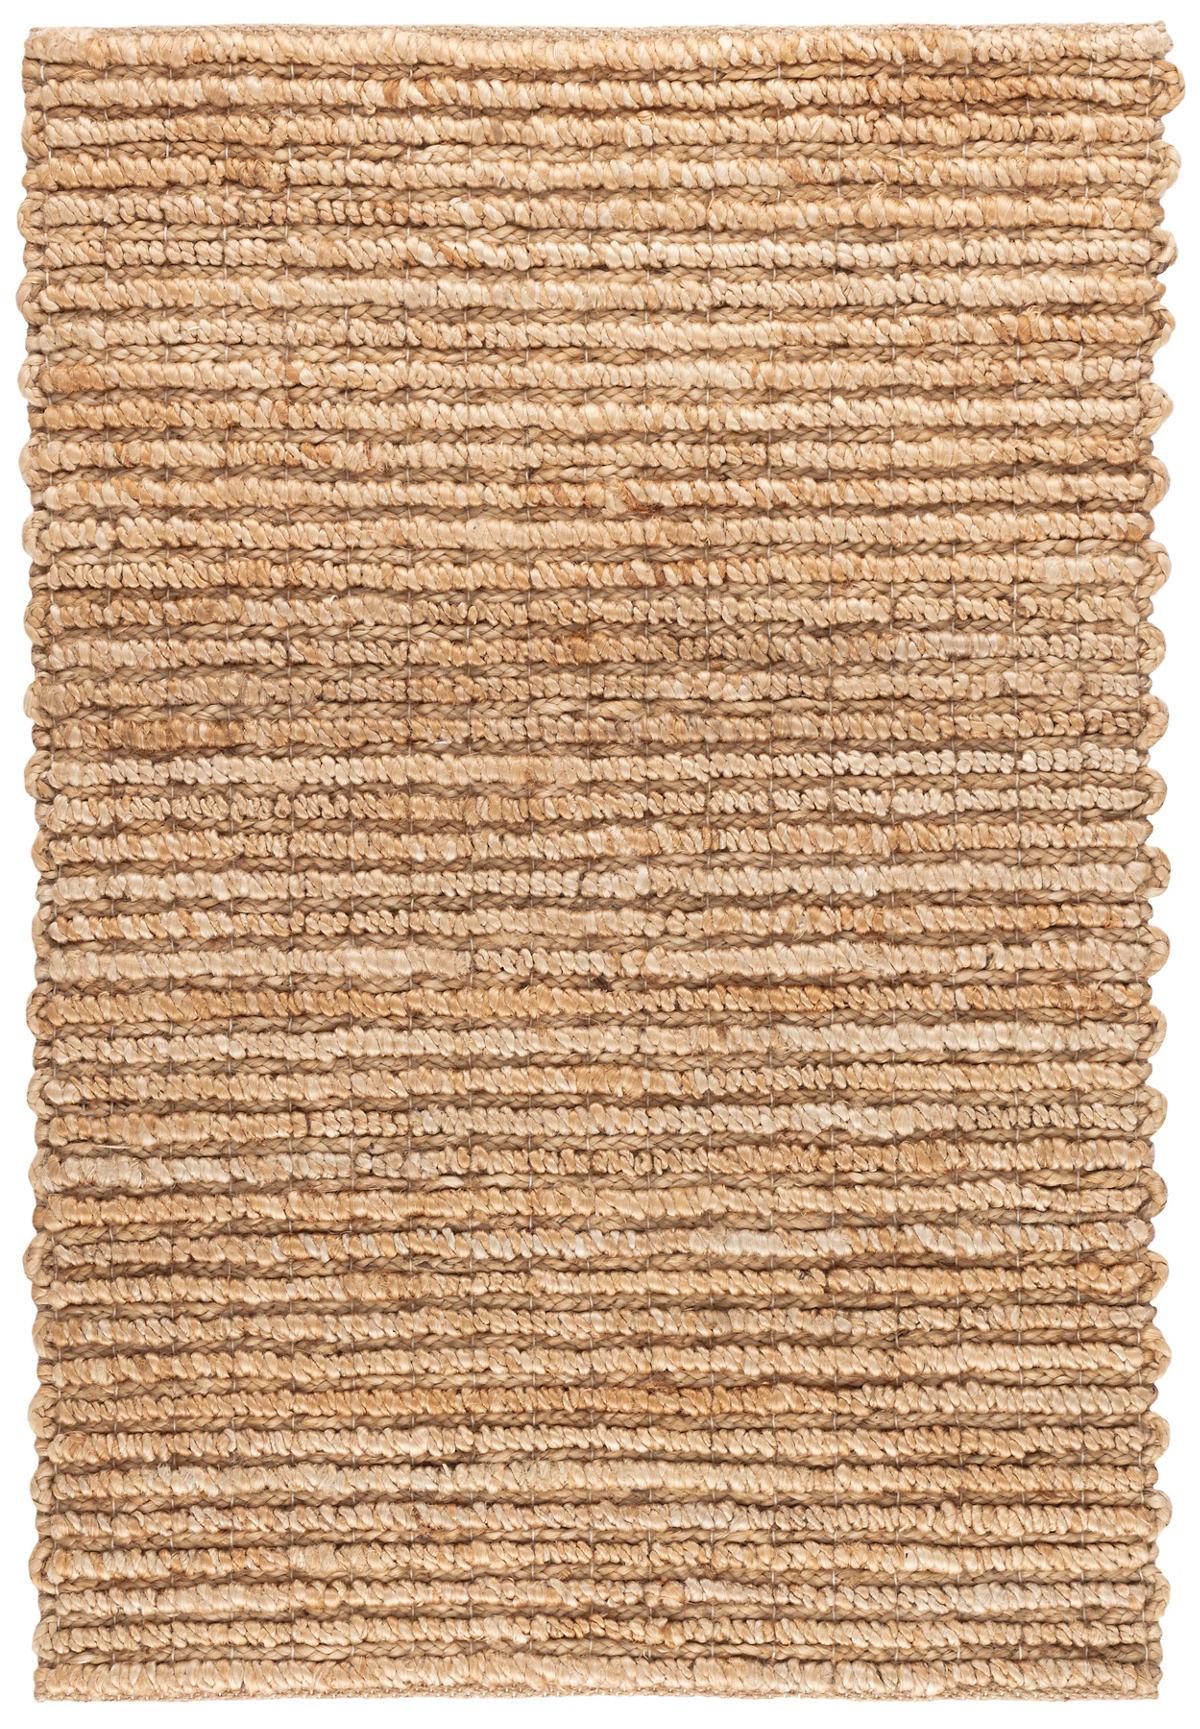 Dunes Natural Woven Jute Rug